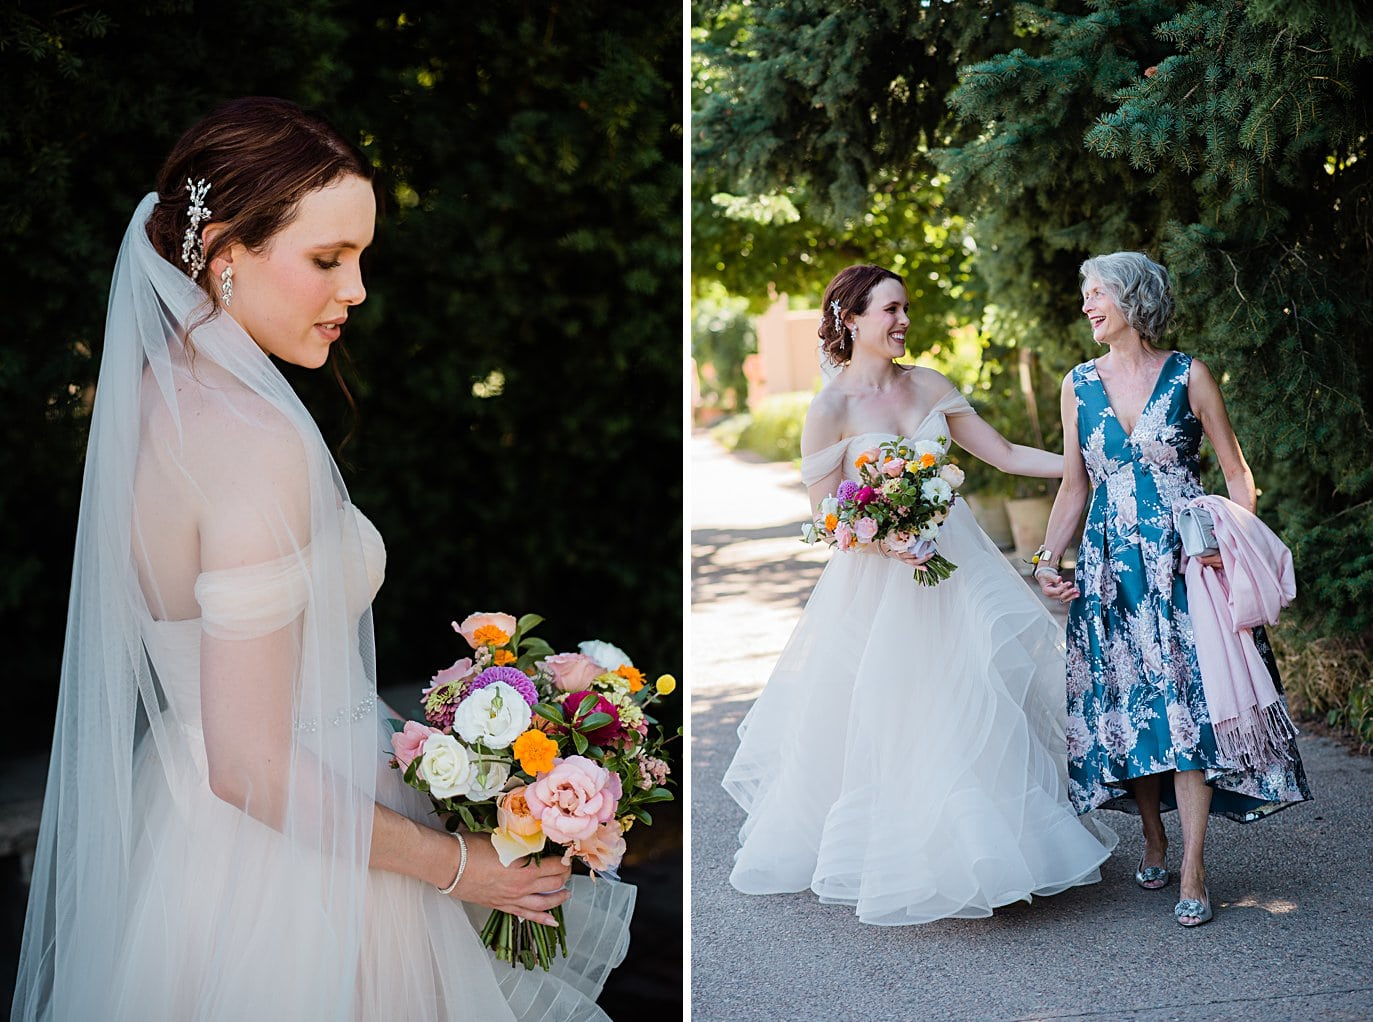 bride and mom walk to ceremony at Denver Botanic Gardens wedding by Denver wedding photographer Jennie Crate